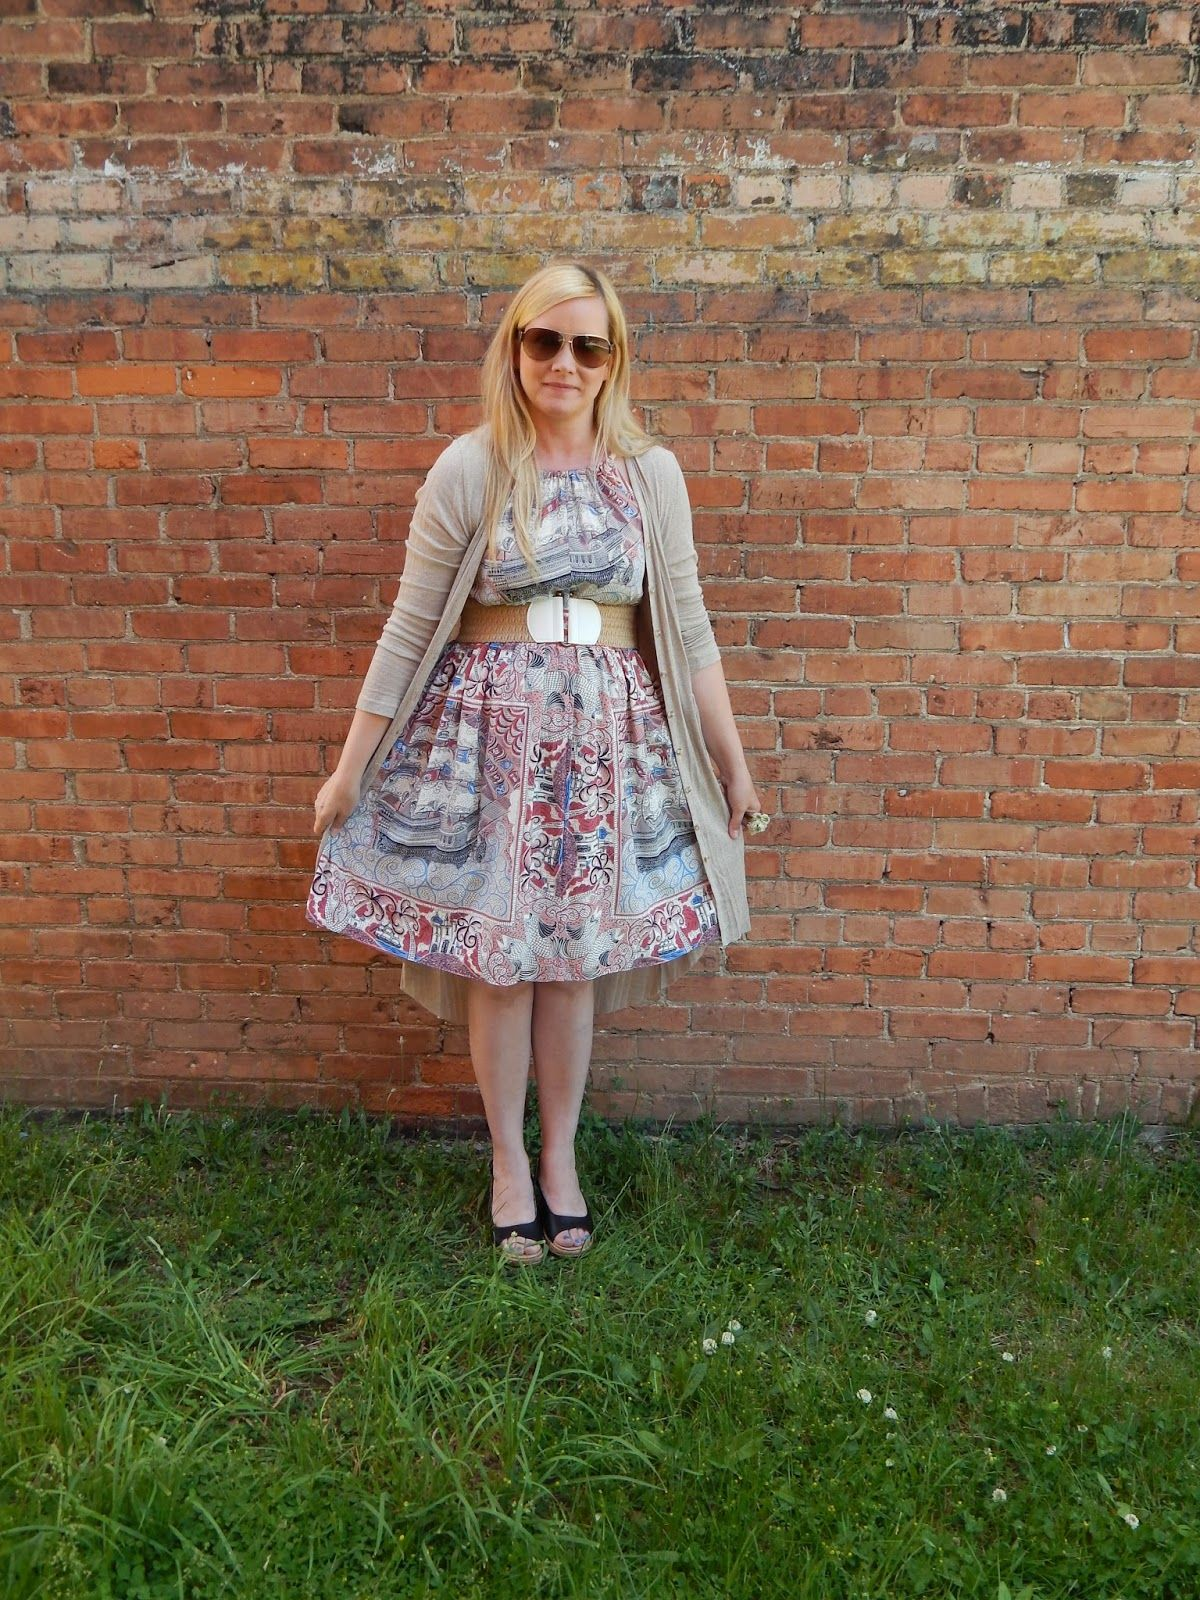 ea4c68ed1cd88 The Peacock Fairy: Repeat Outfit Combo + Deal Sighting #ootd #maternity  #anthropologie #floreat #castlelake #maxicardi #crocs